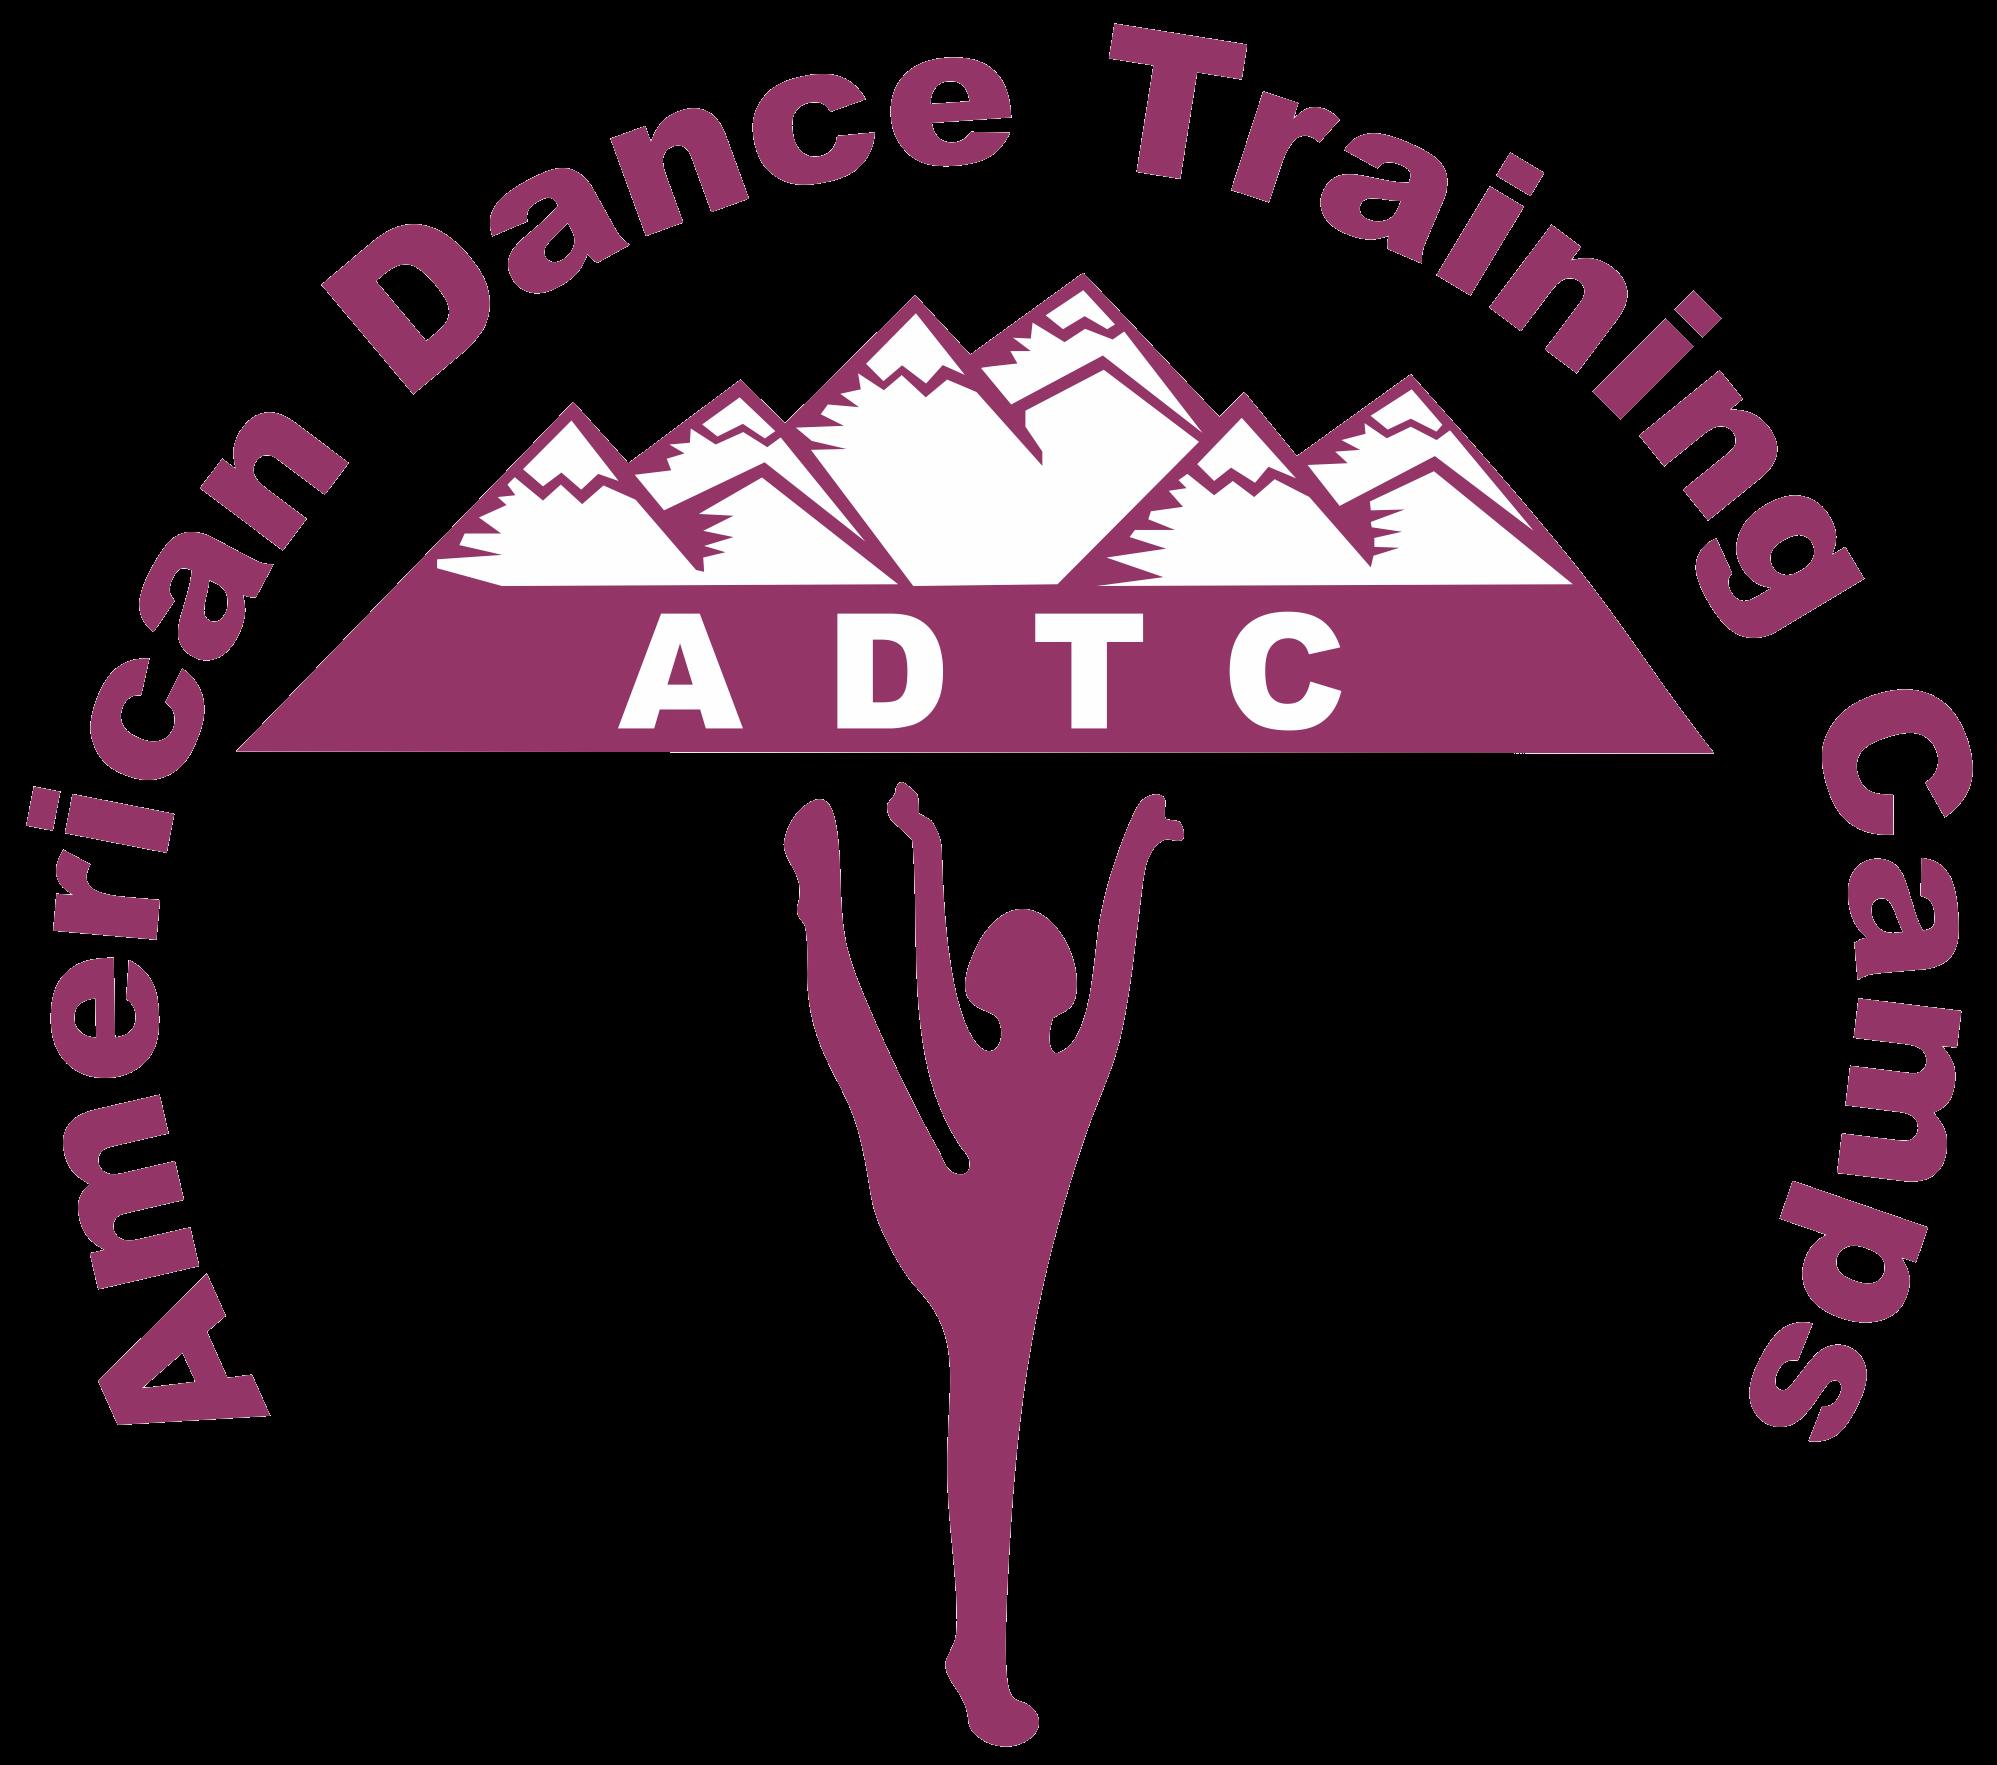 ADTC Green Mountains Dance Camp - Stratton, VT